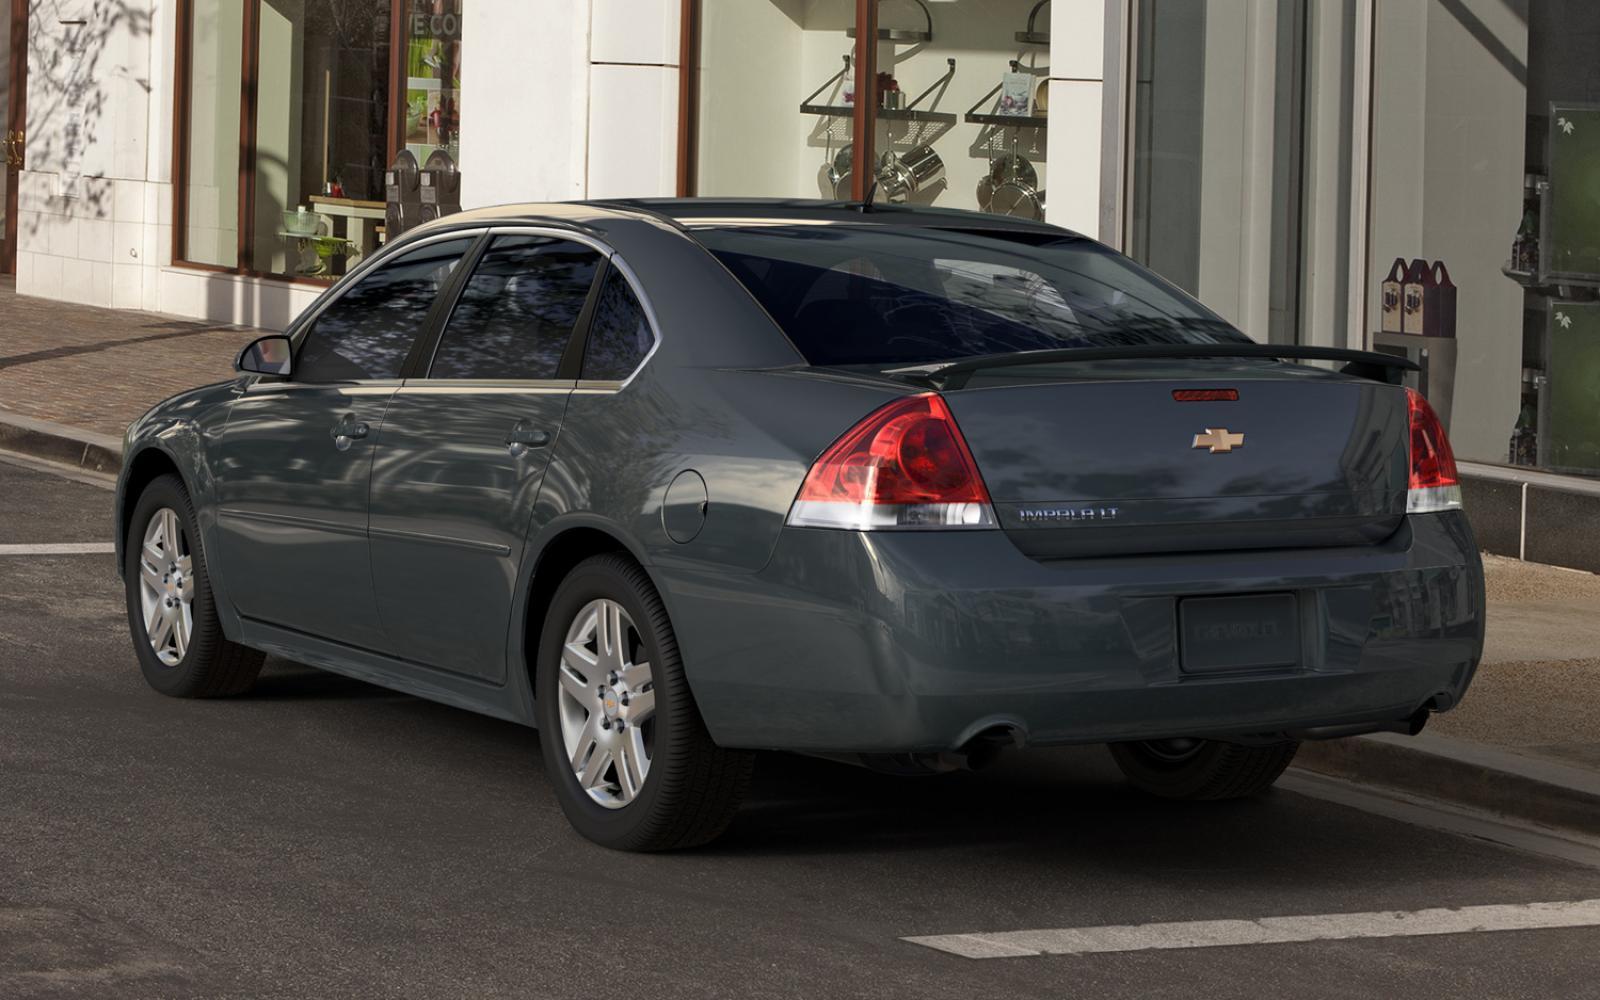 800 1024 1280 1600 origin 2014 chevrolet impala